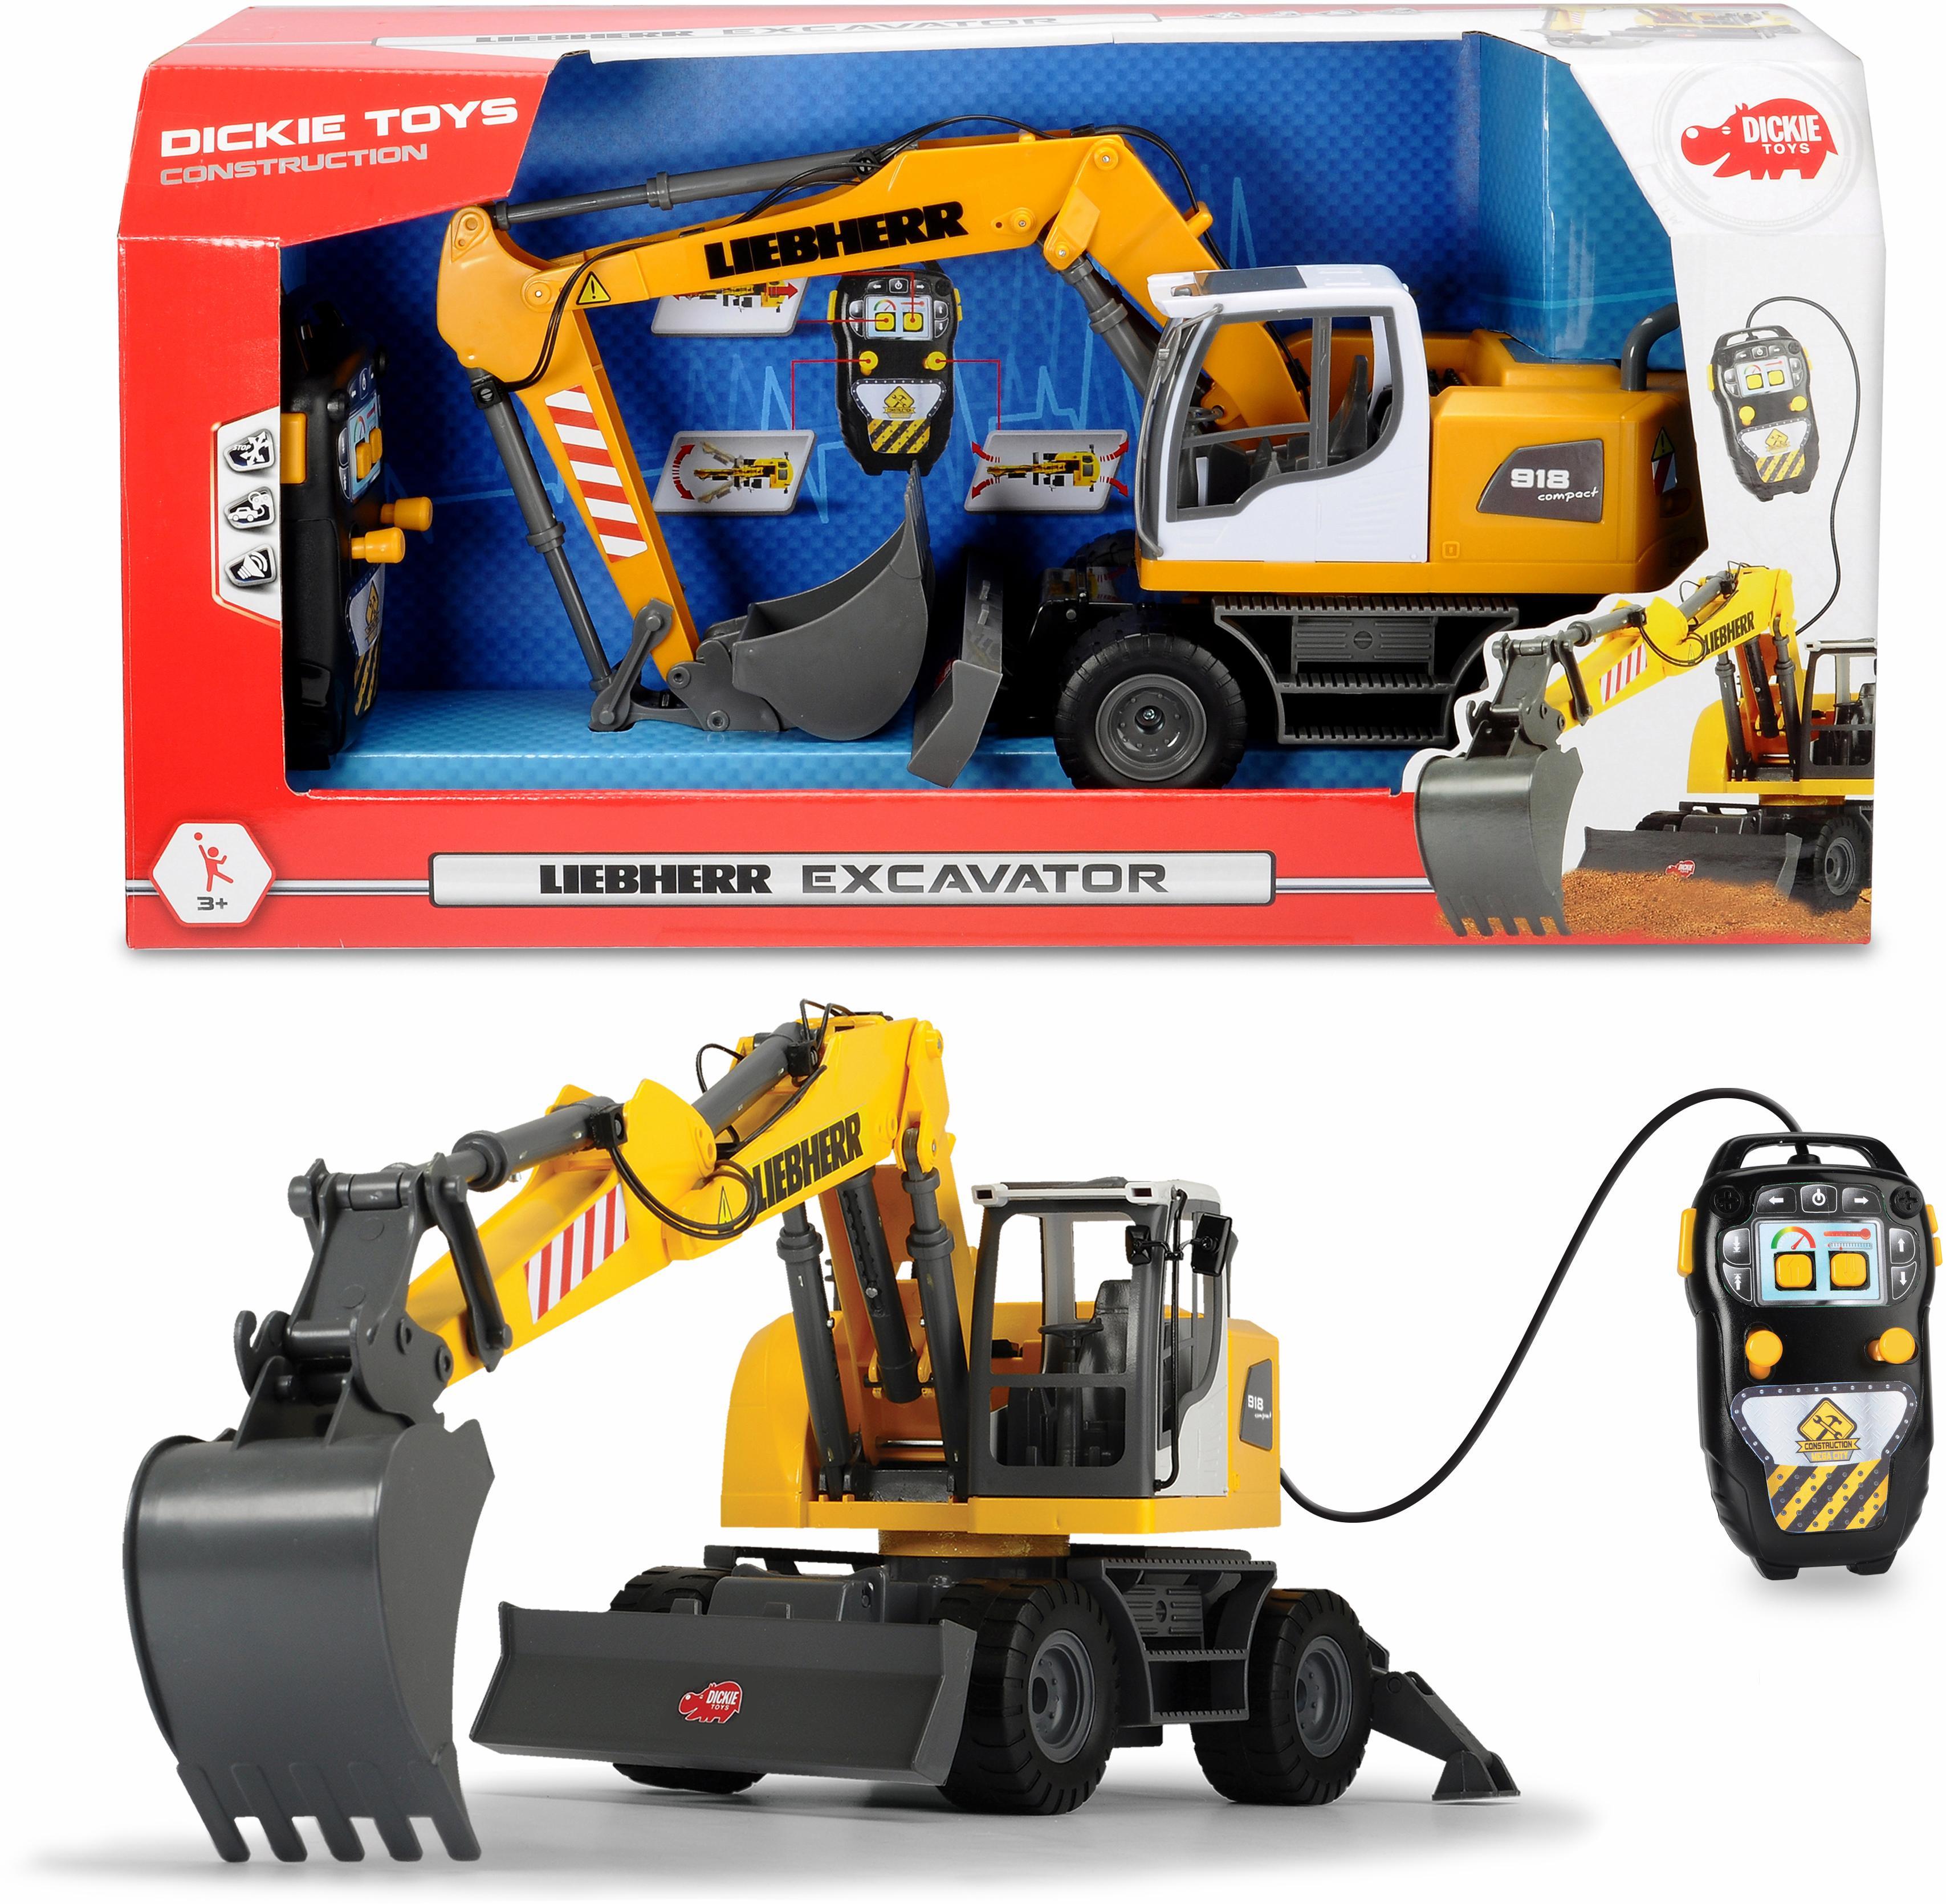 dickie toys spielzeug bagger liebherr excavator auf raten. Black Bedroom Furniture Sets. Home Design Ideas